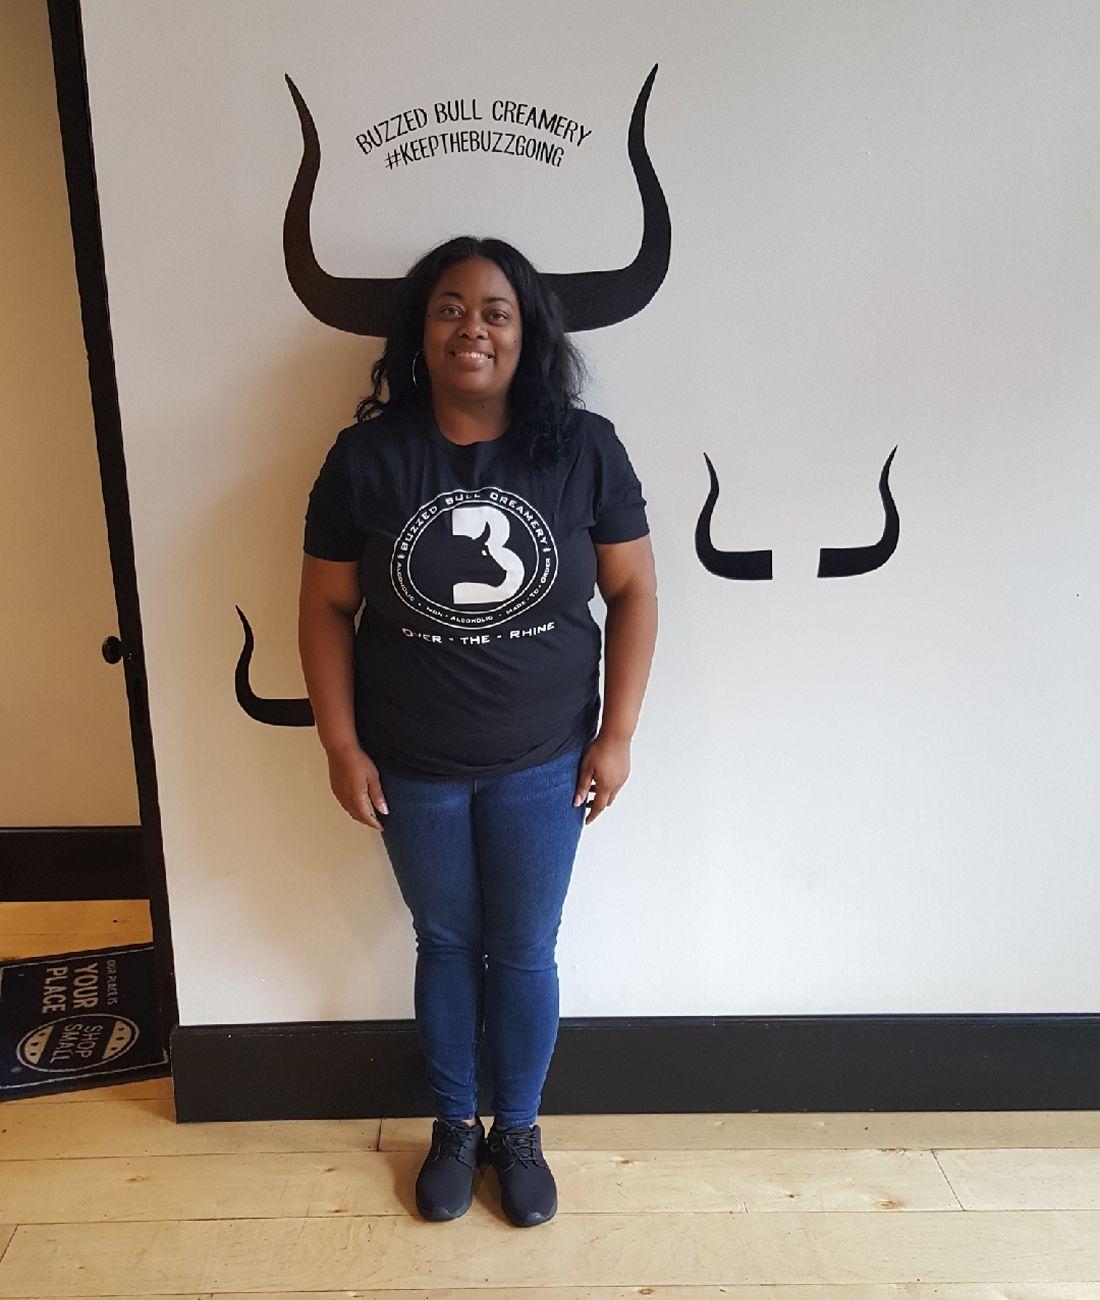 Buzzed Bull Creamery Takes on Atlanta